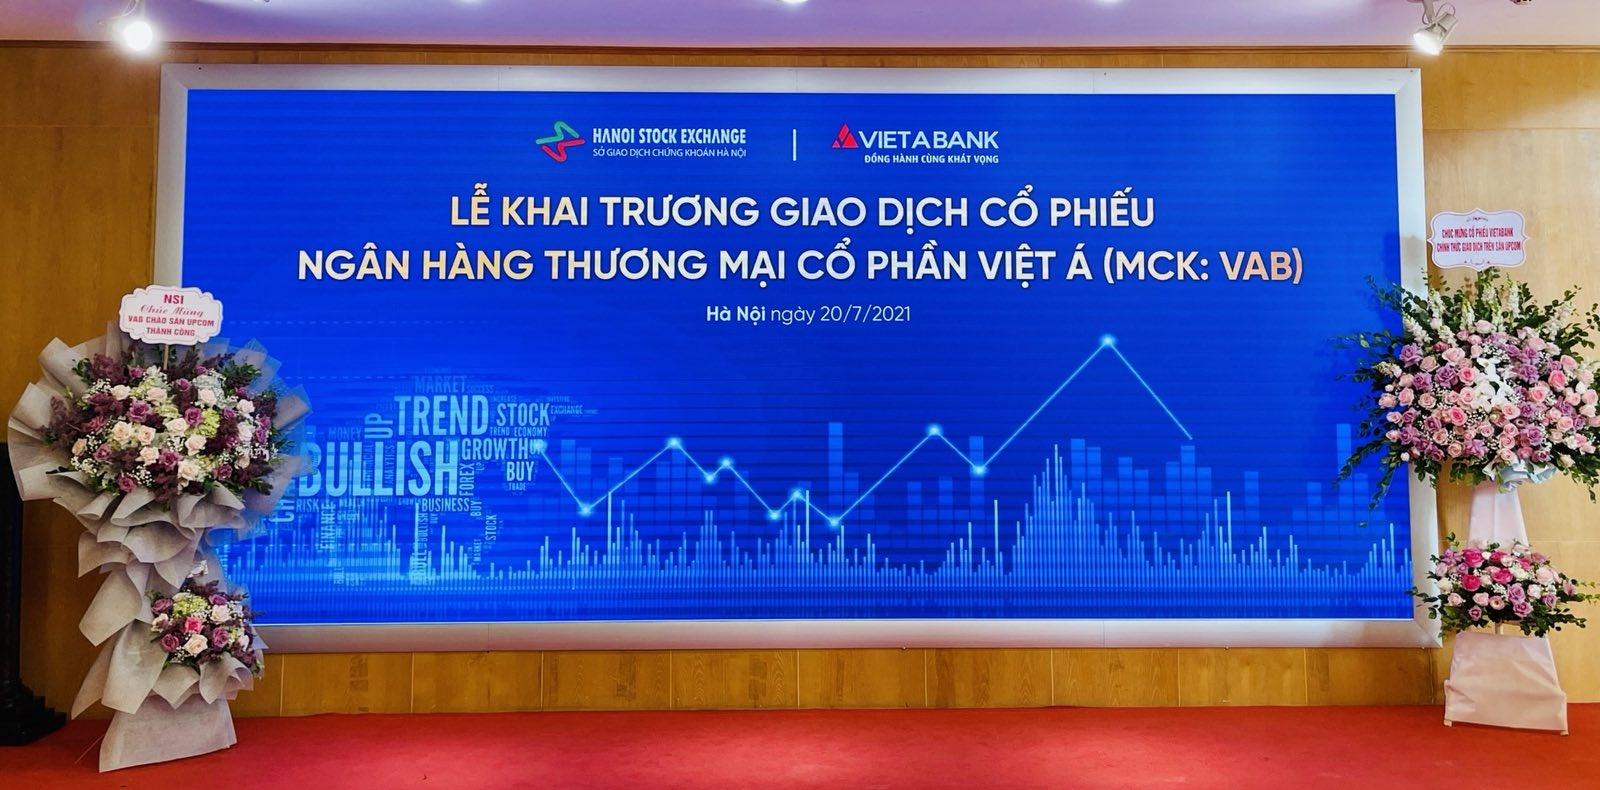 445 trieu co phieu cua vietabank chinh thuc len san upcom